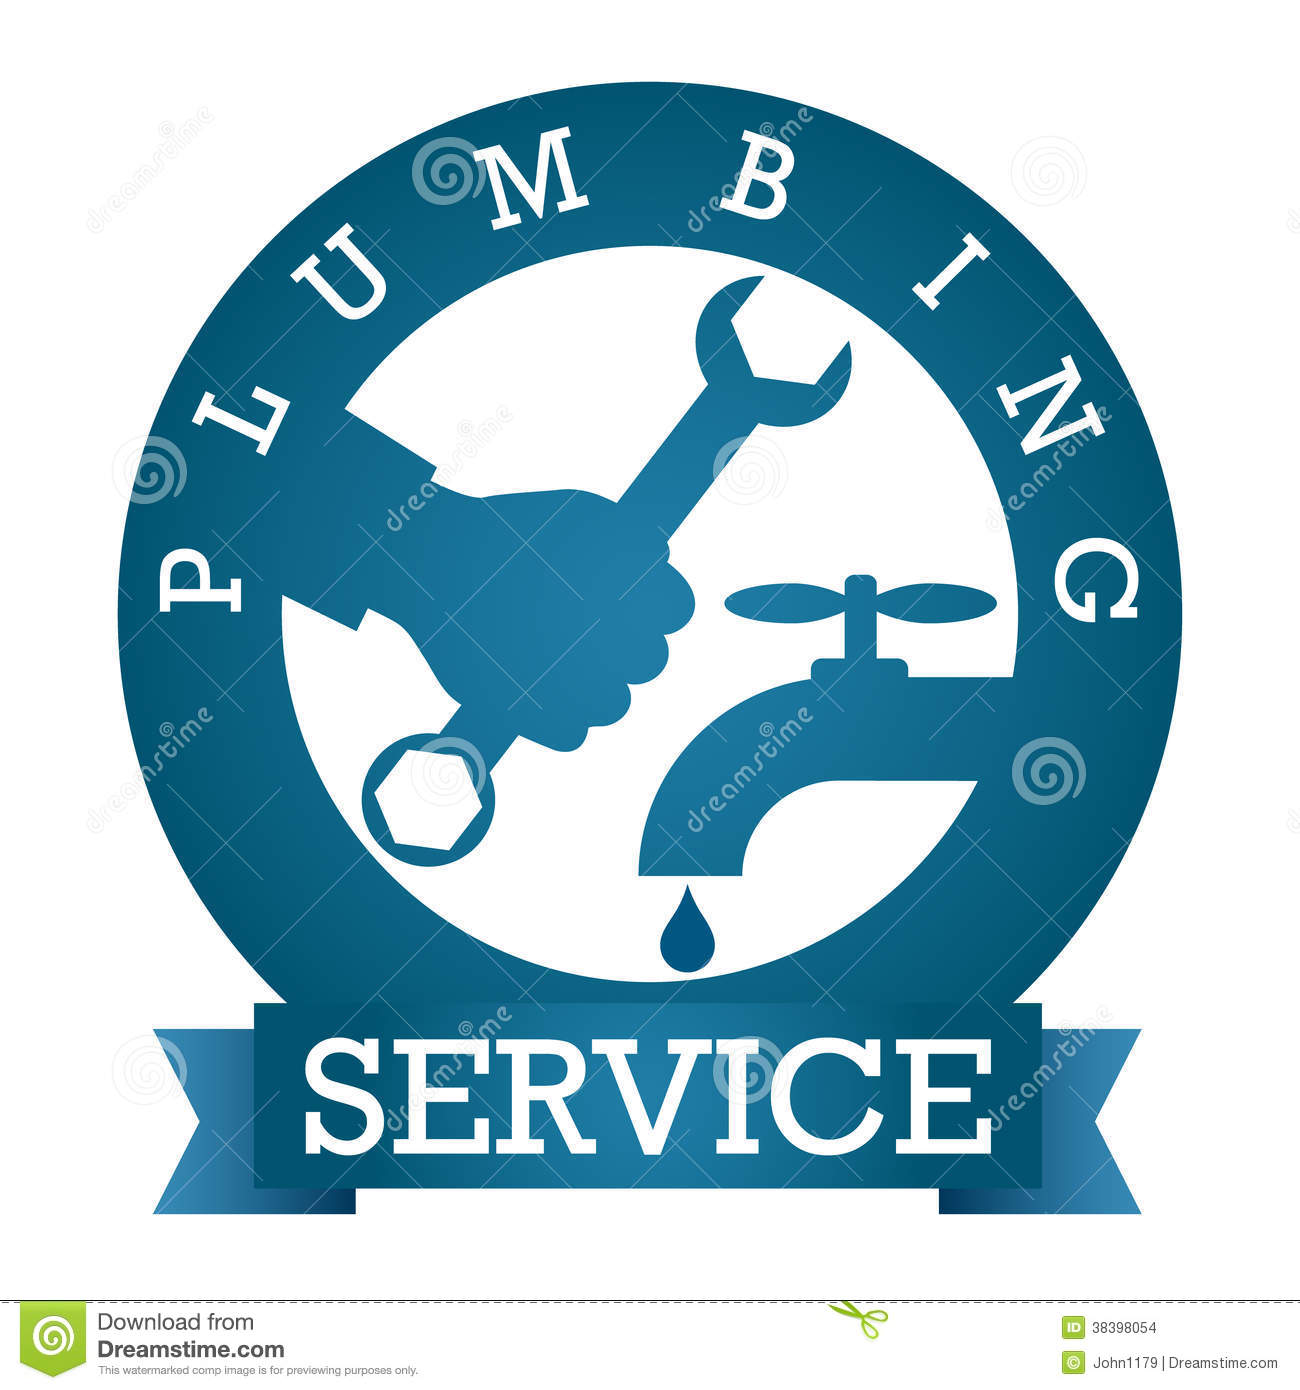 Plumbing logo clipart picture freeuse Plumbing logo clipart - ClipartFest picture freeuse